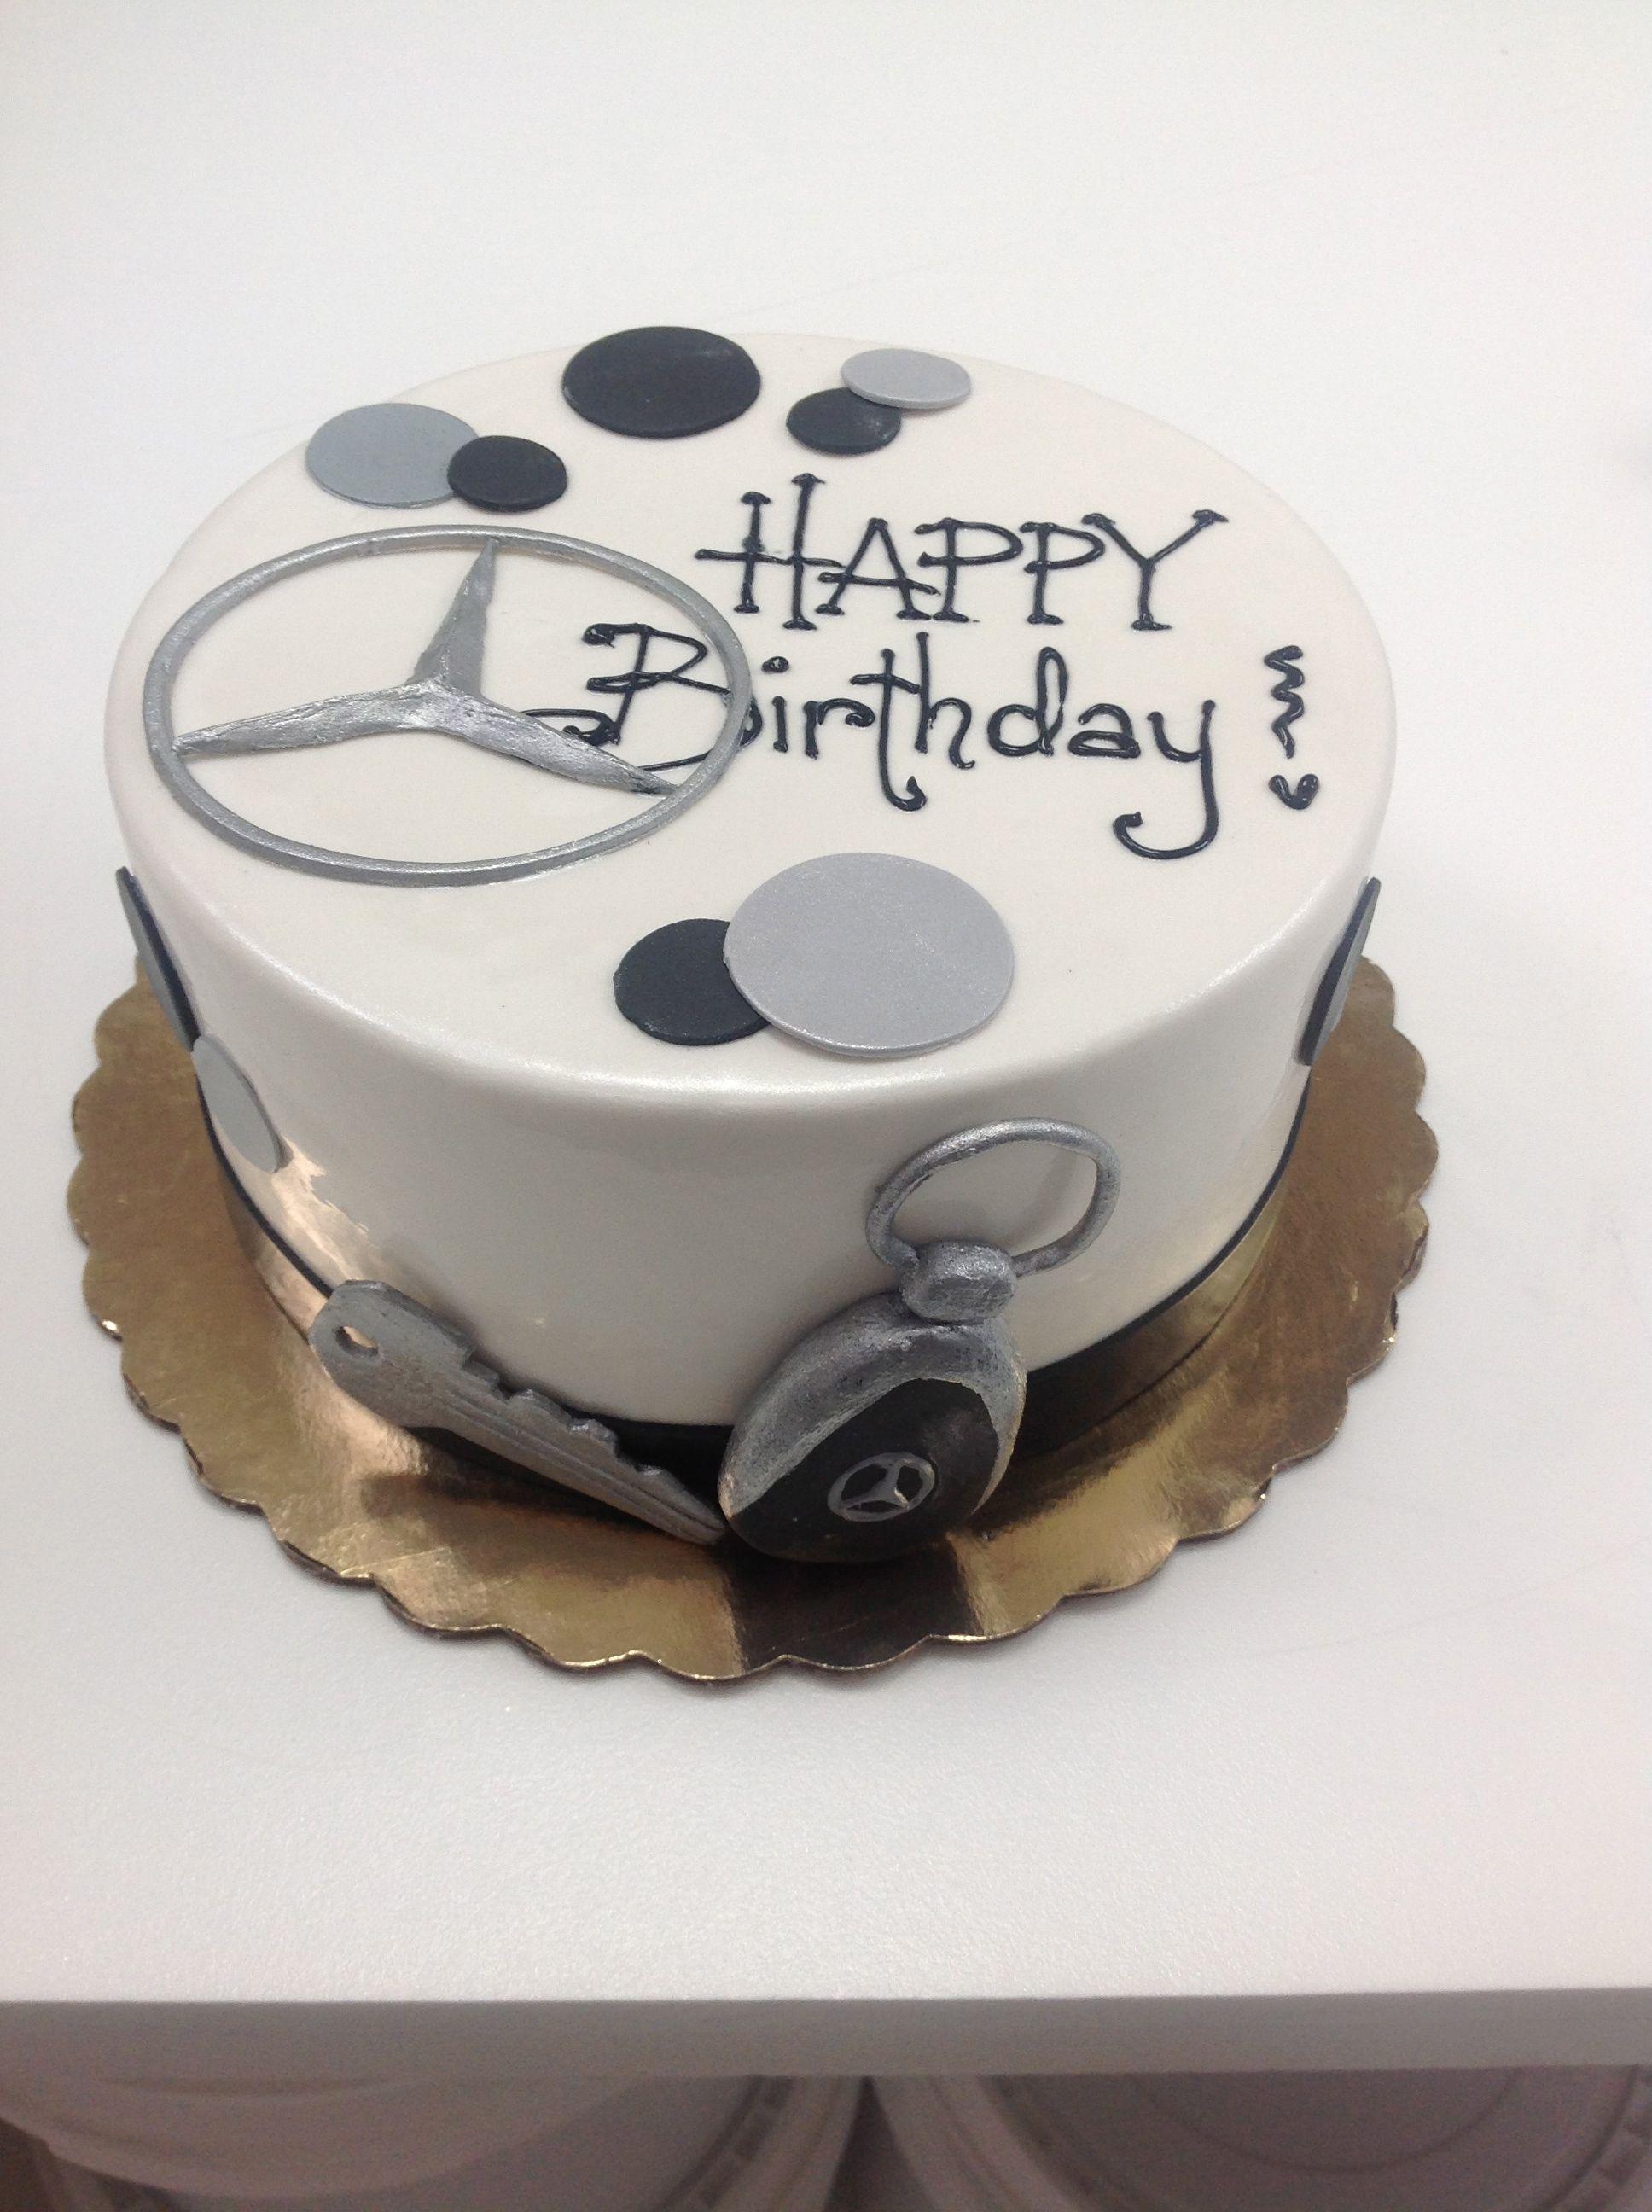 Mercedes  Occasion Cakes in 2019  Pinterest  Cake Birthday Cake und Bmw cake